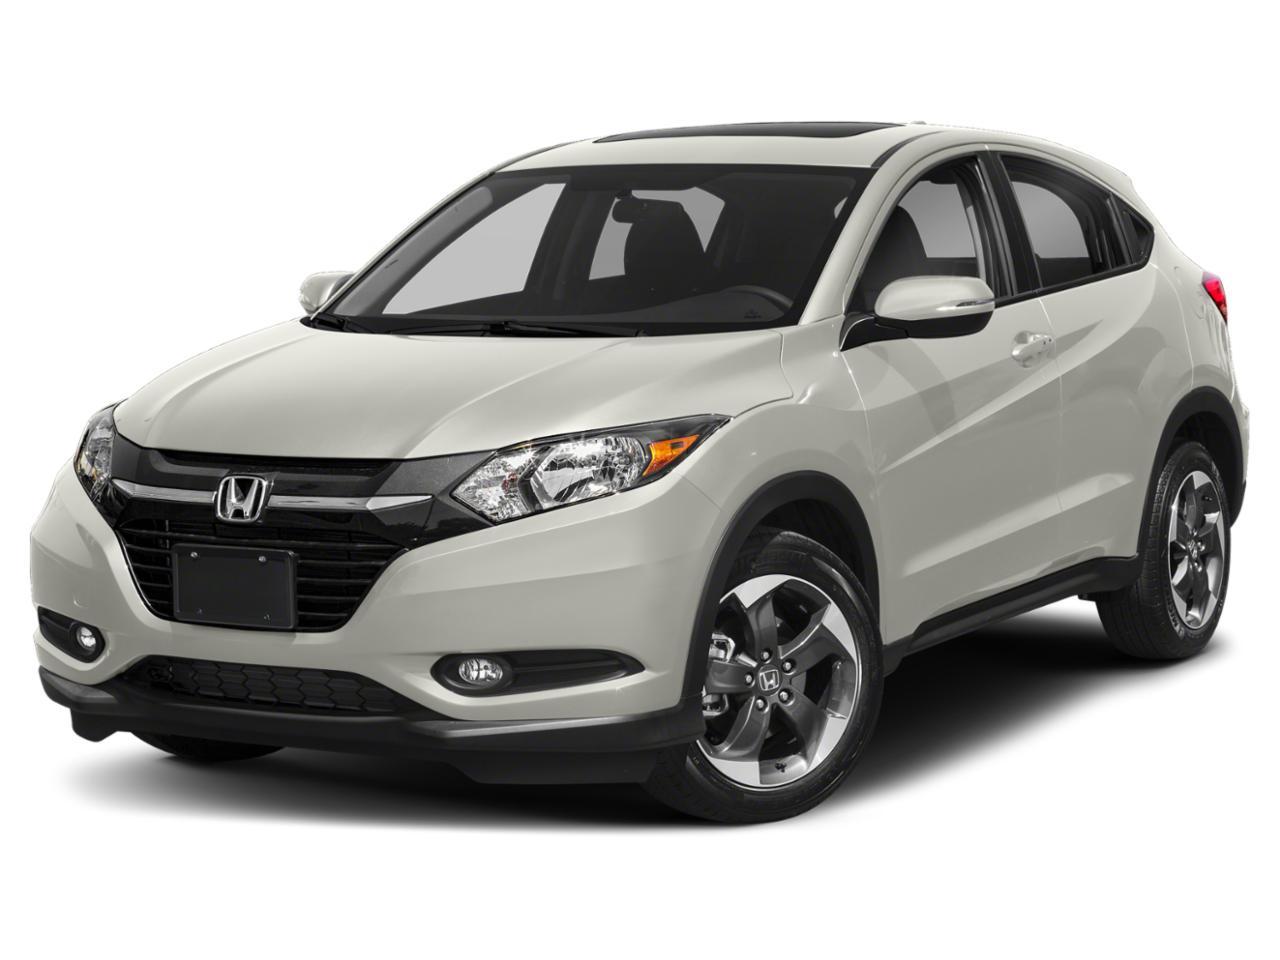 2018 Honda HR-V Vehicle Photo in Cary, NC 27511